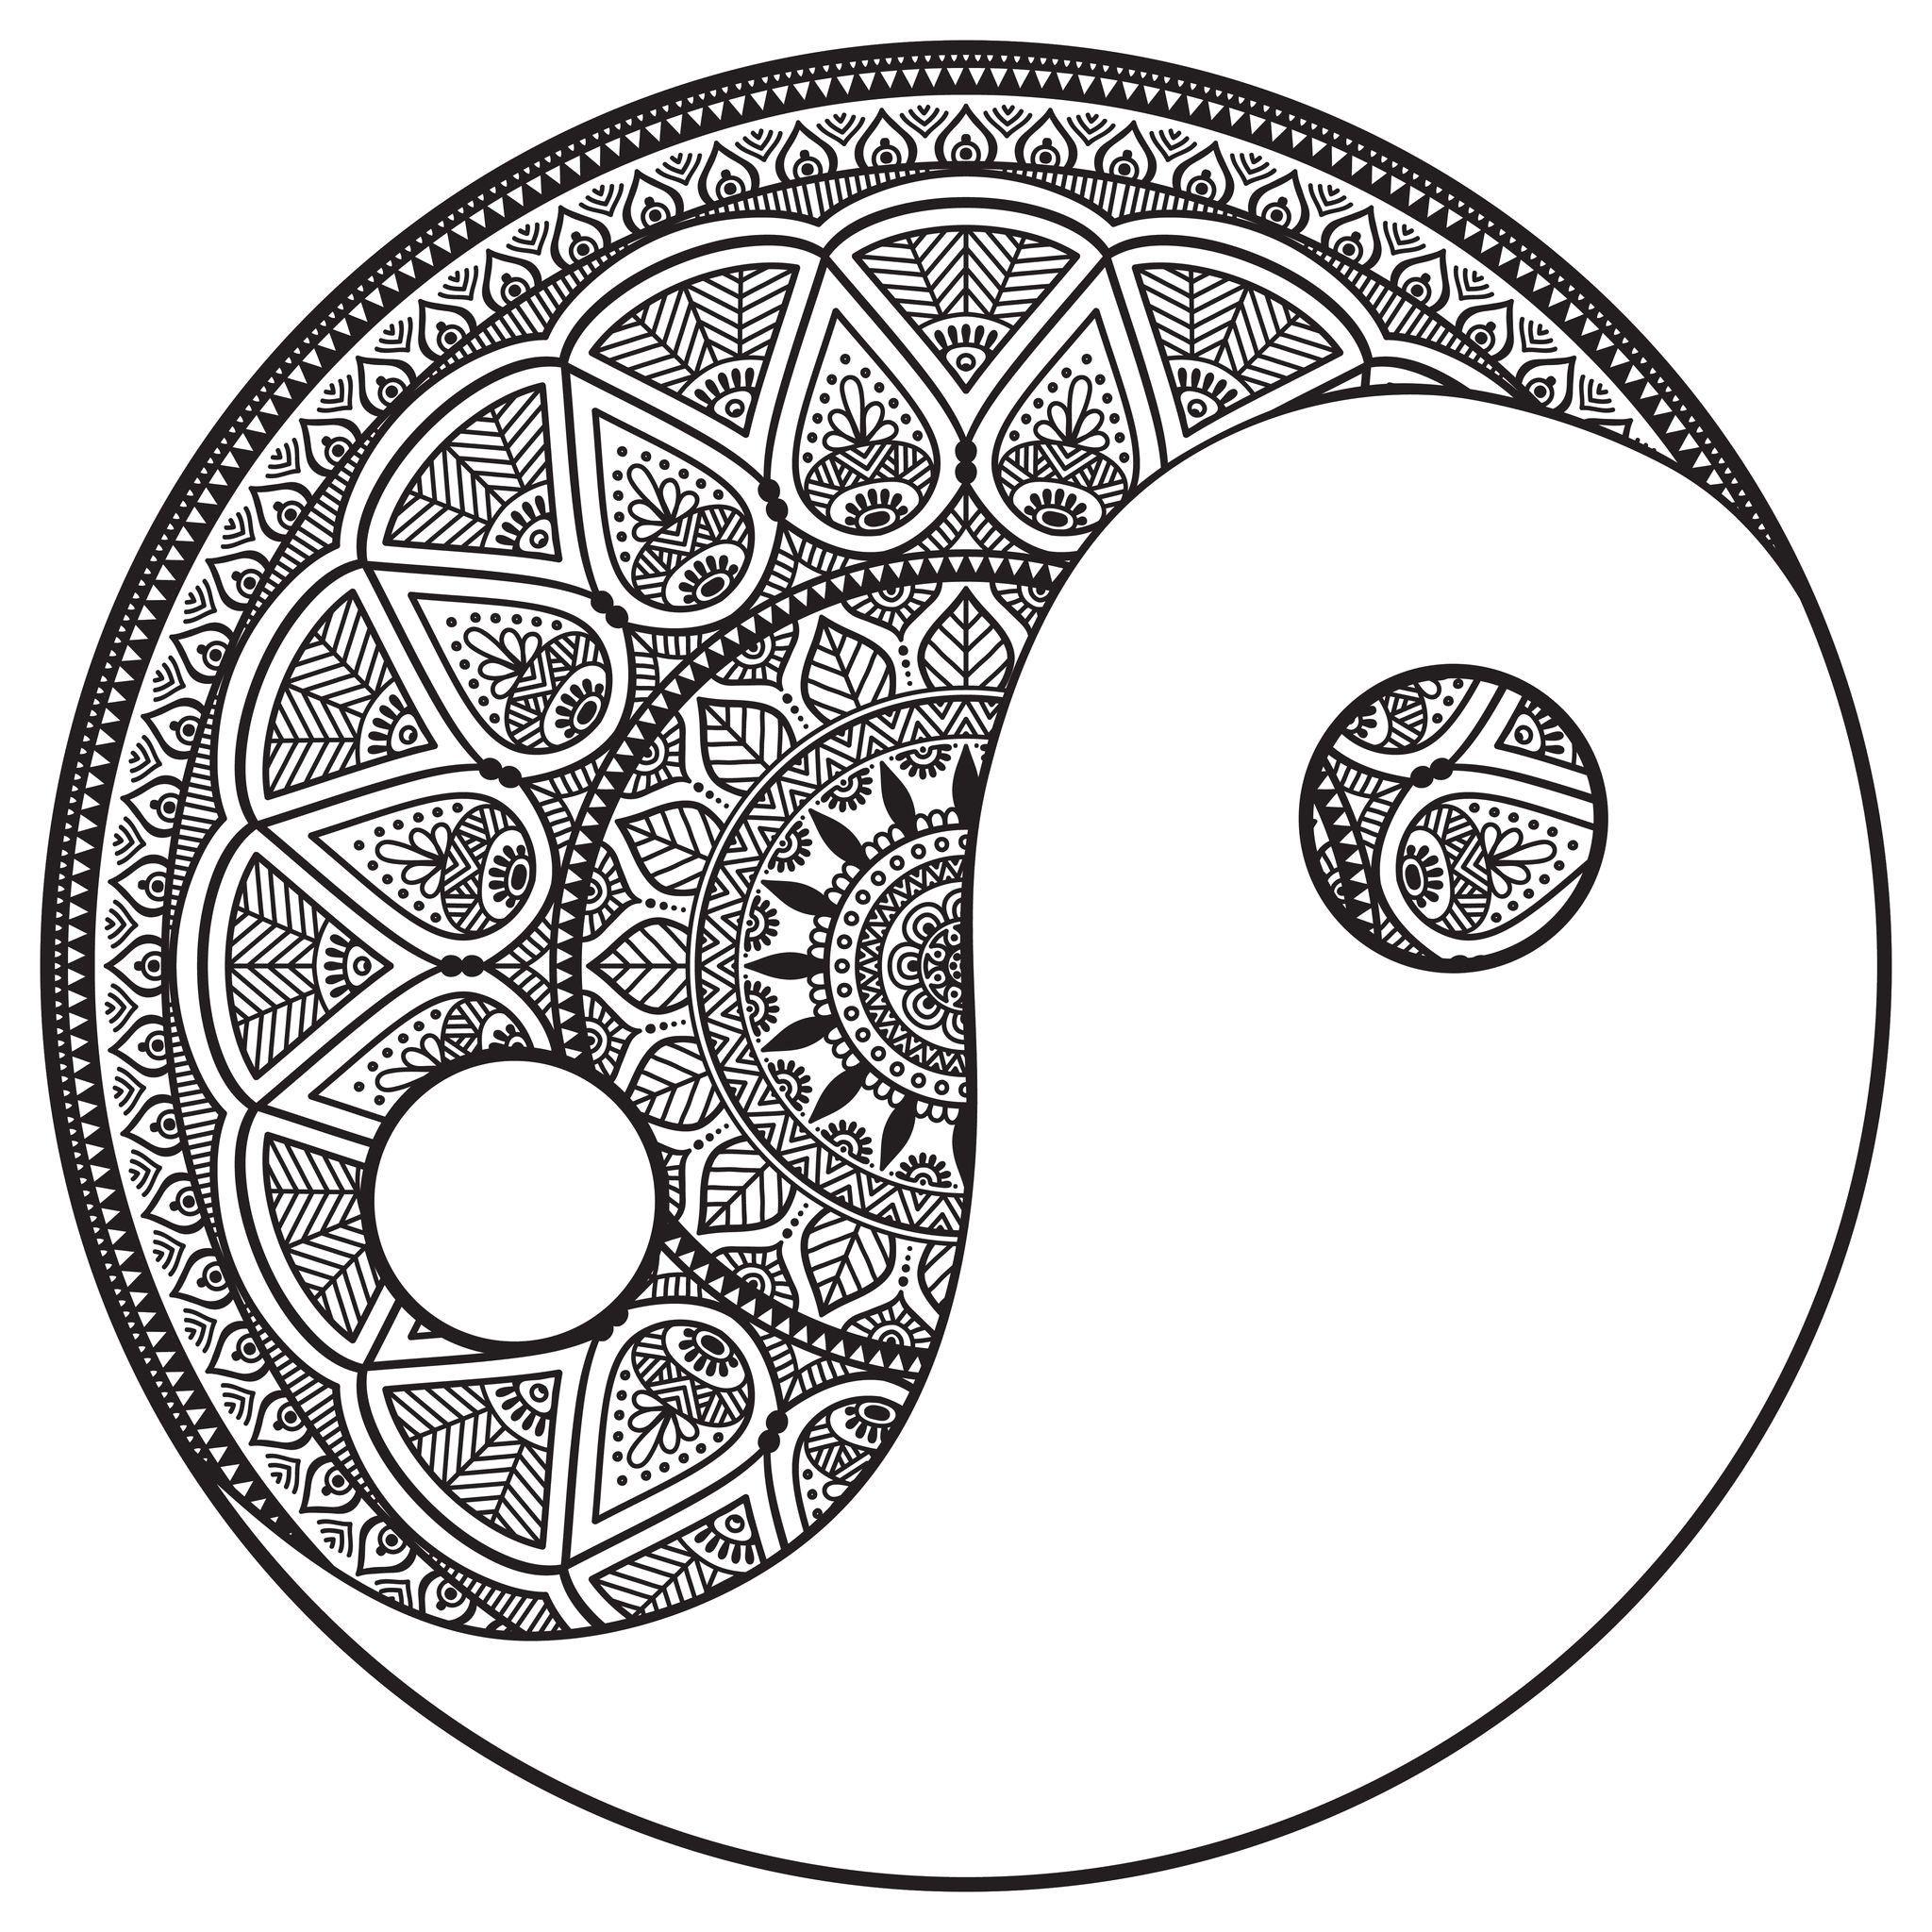 Yin Yang Png Indian Mandala Furniture Plaster Home Decor Crafts T Shirt Clothes Print 2048x2048px Digital Product Png Chakra Art In 2021 Mandala Coloring Mandala Coloring Pages Mandala Art Lesson